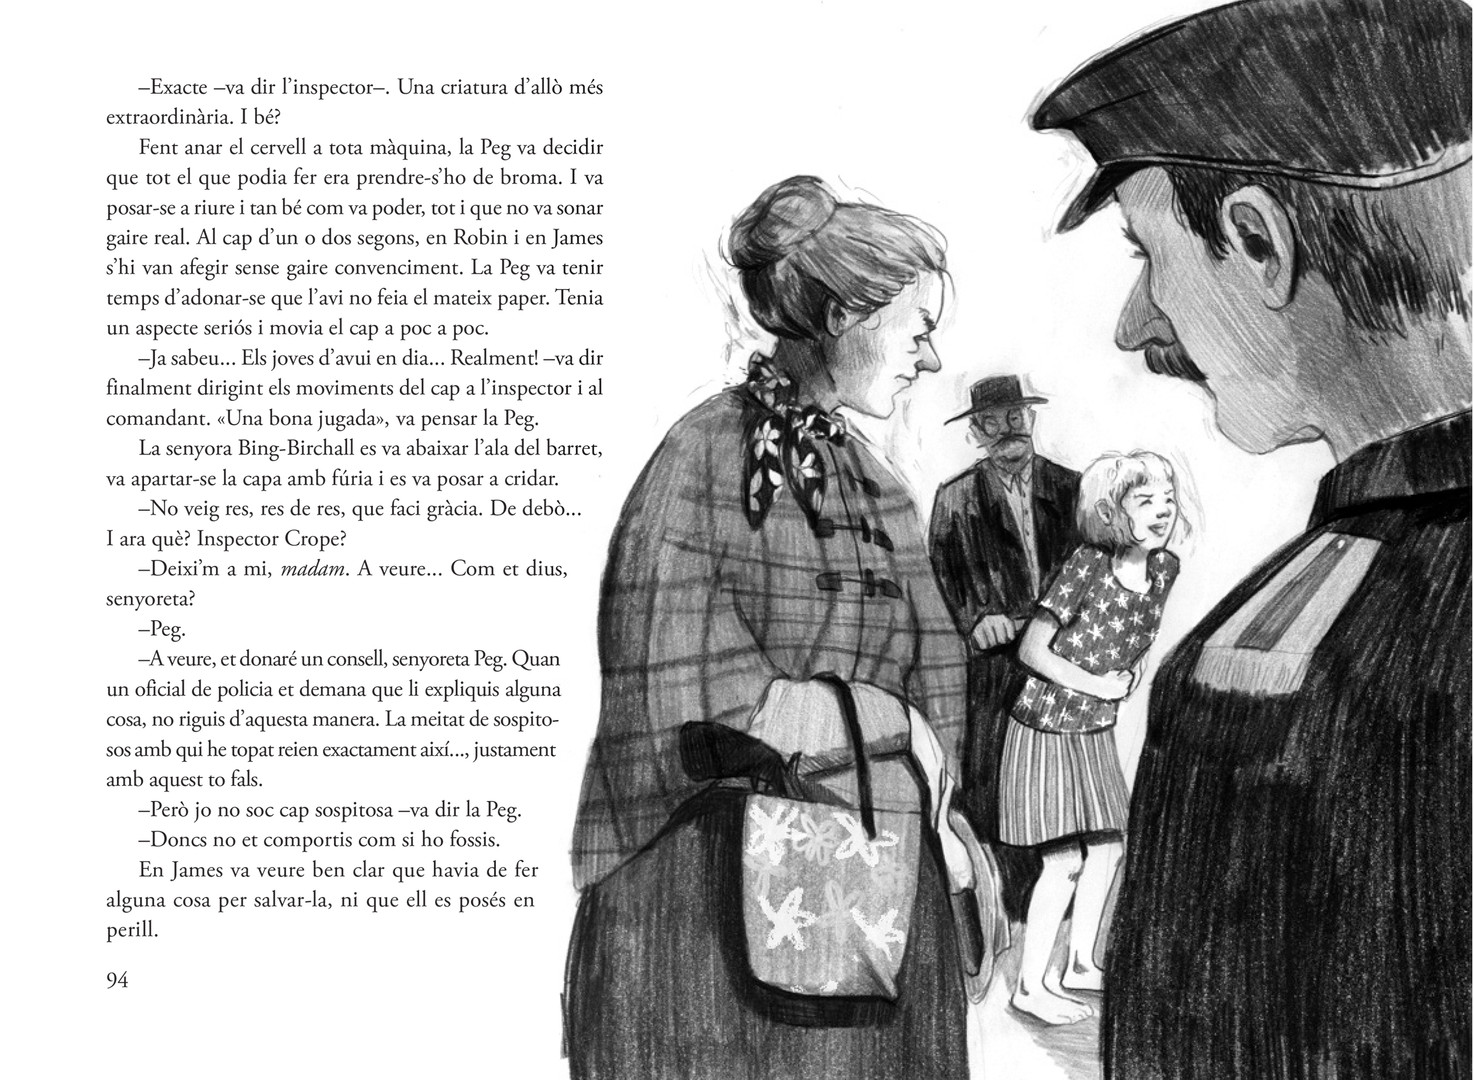 Snoggle illustration